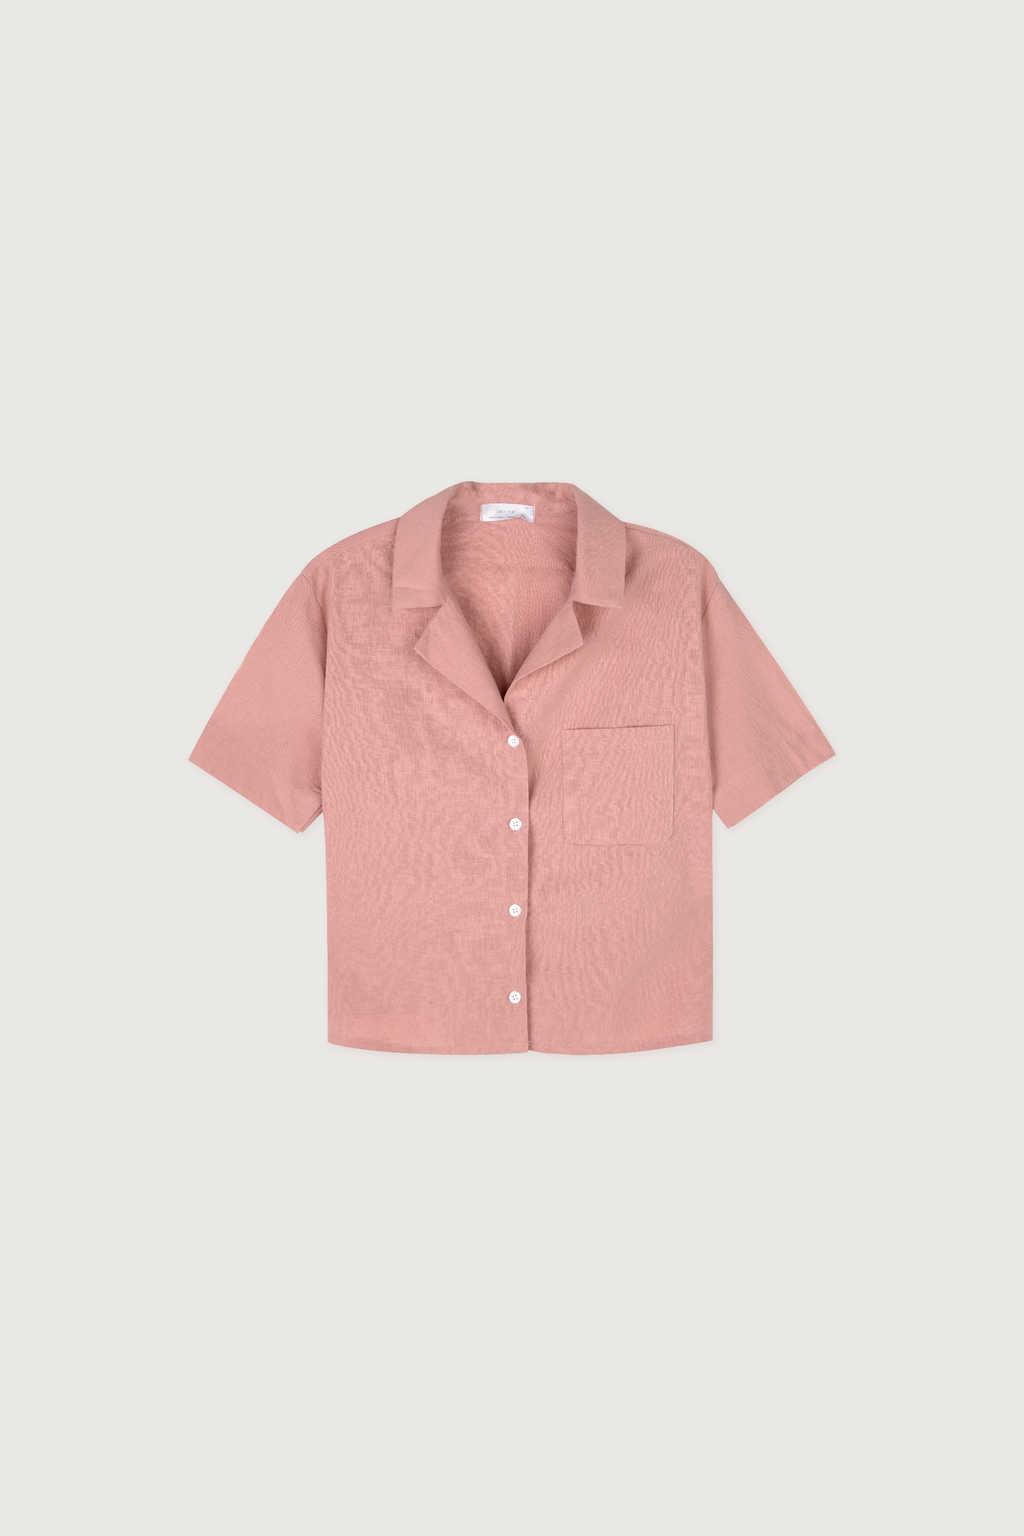 Blouse K027 Pink 10